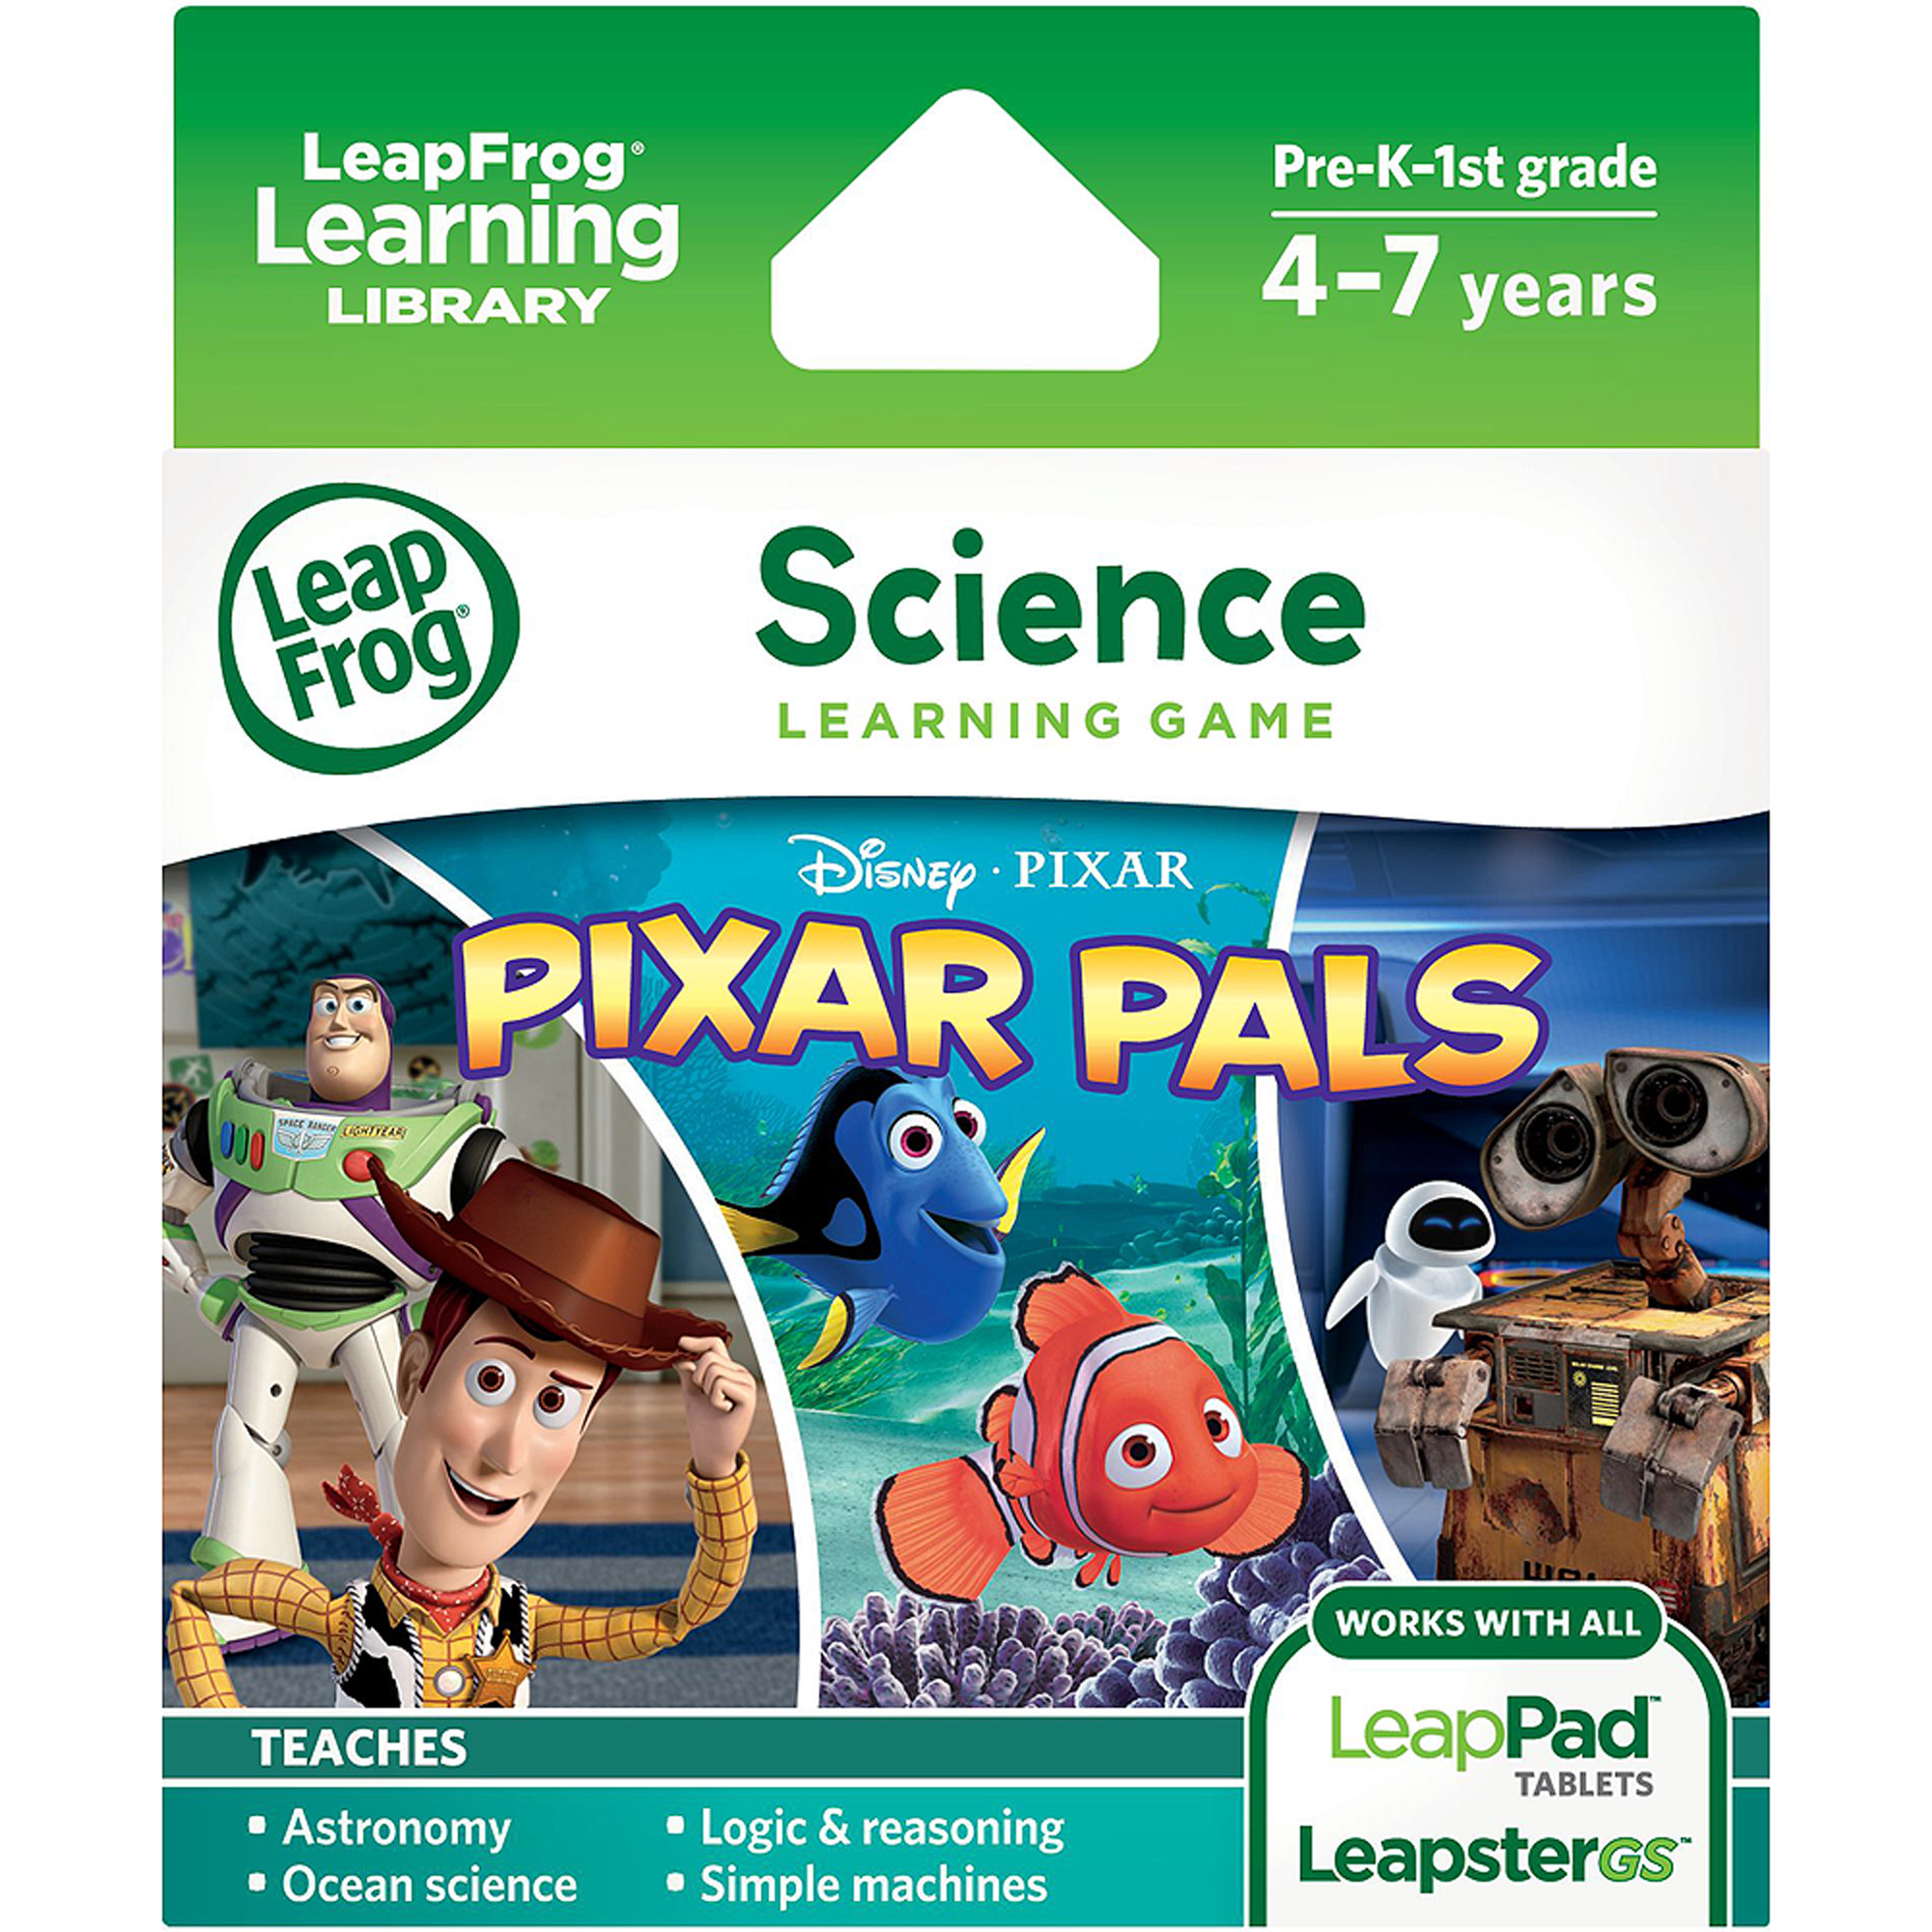 LeapFrog Explorer & LeapPad Learning Game: Disney-Pixar Pixar Pals